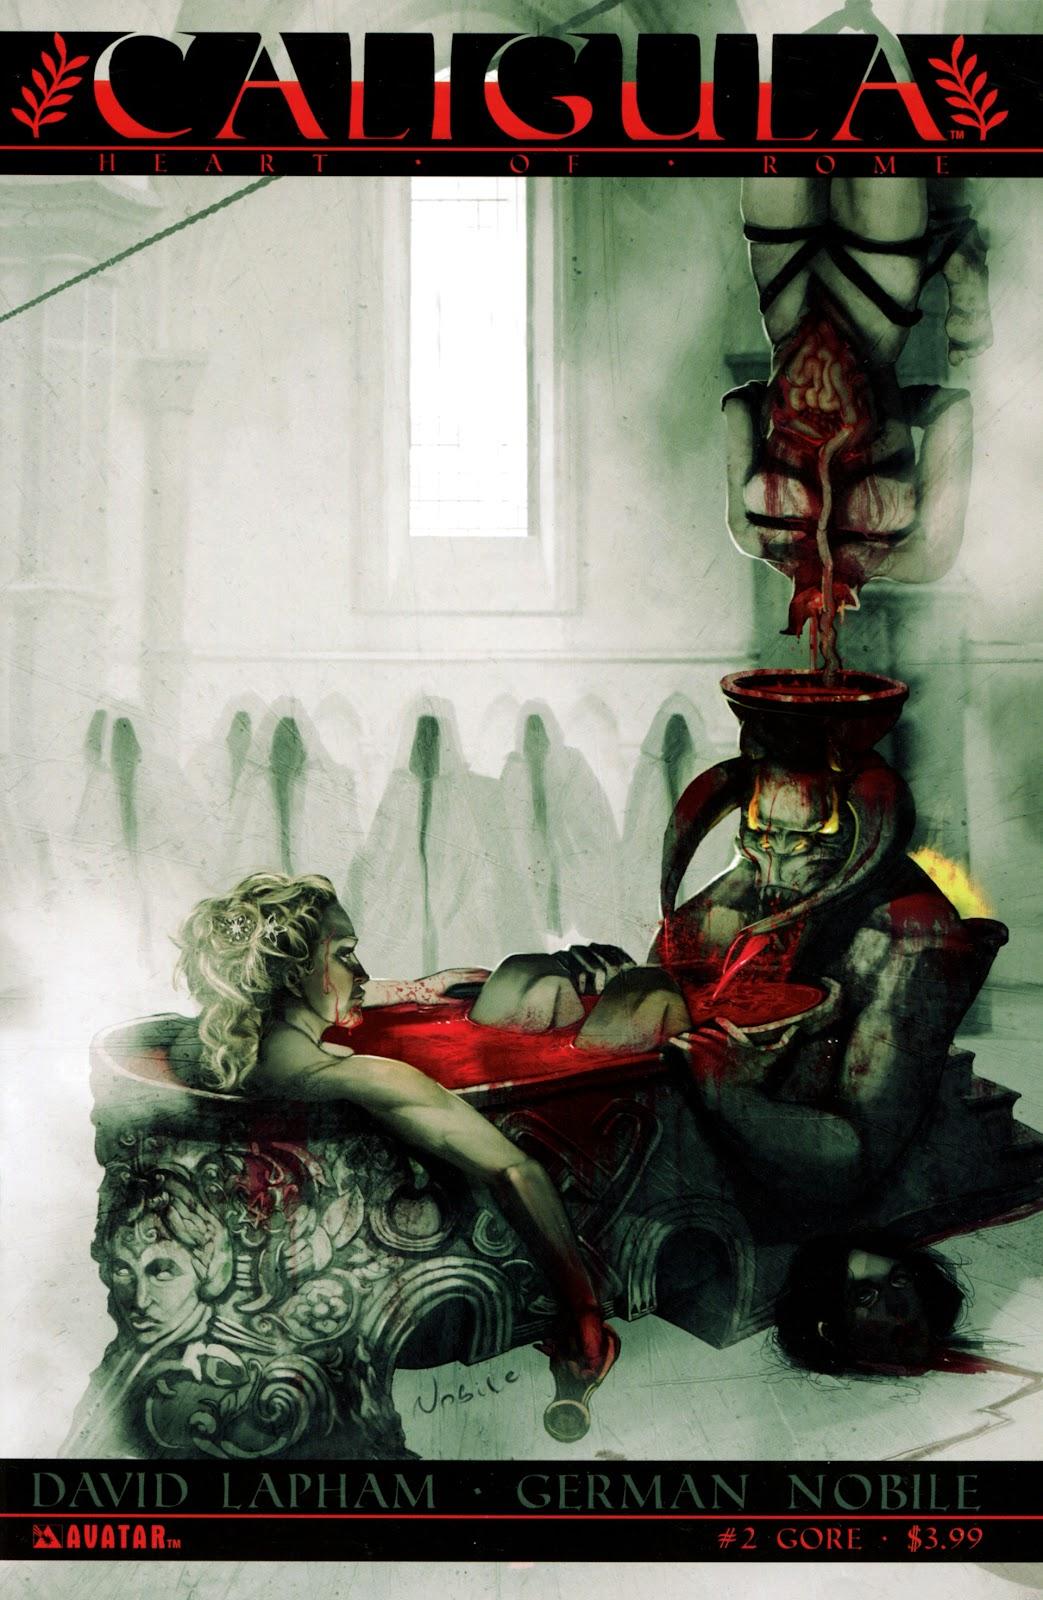 Caligula: Heart of Rome Issue #2 #2 - English 1